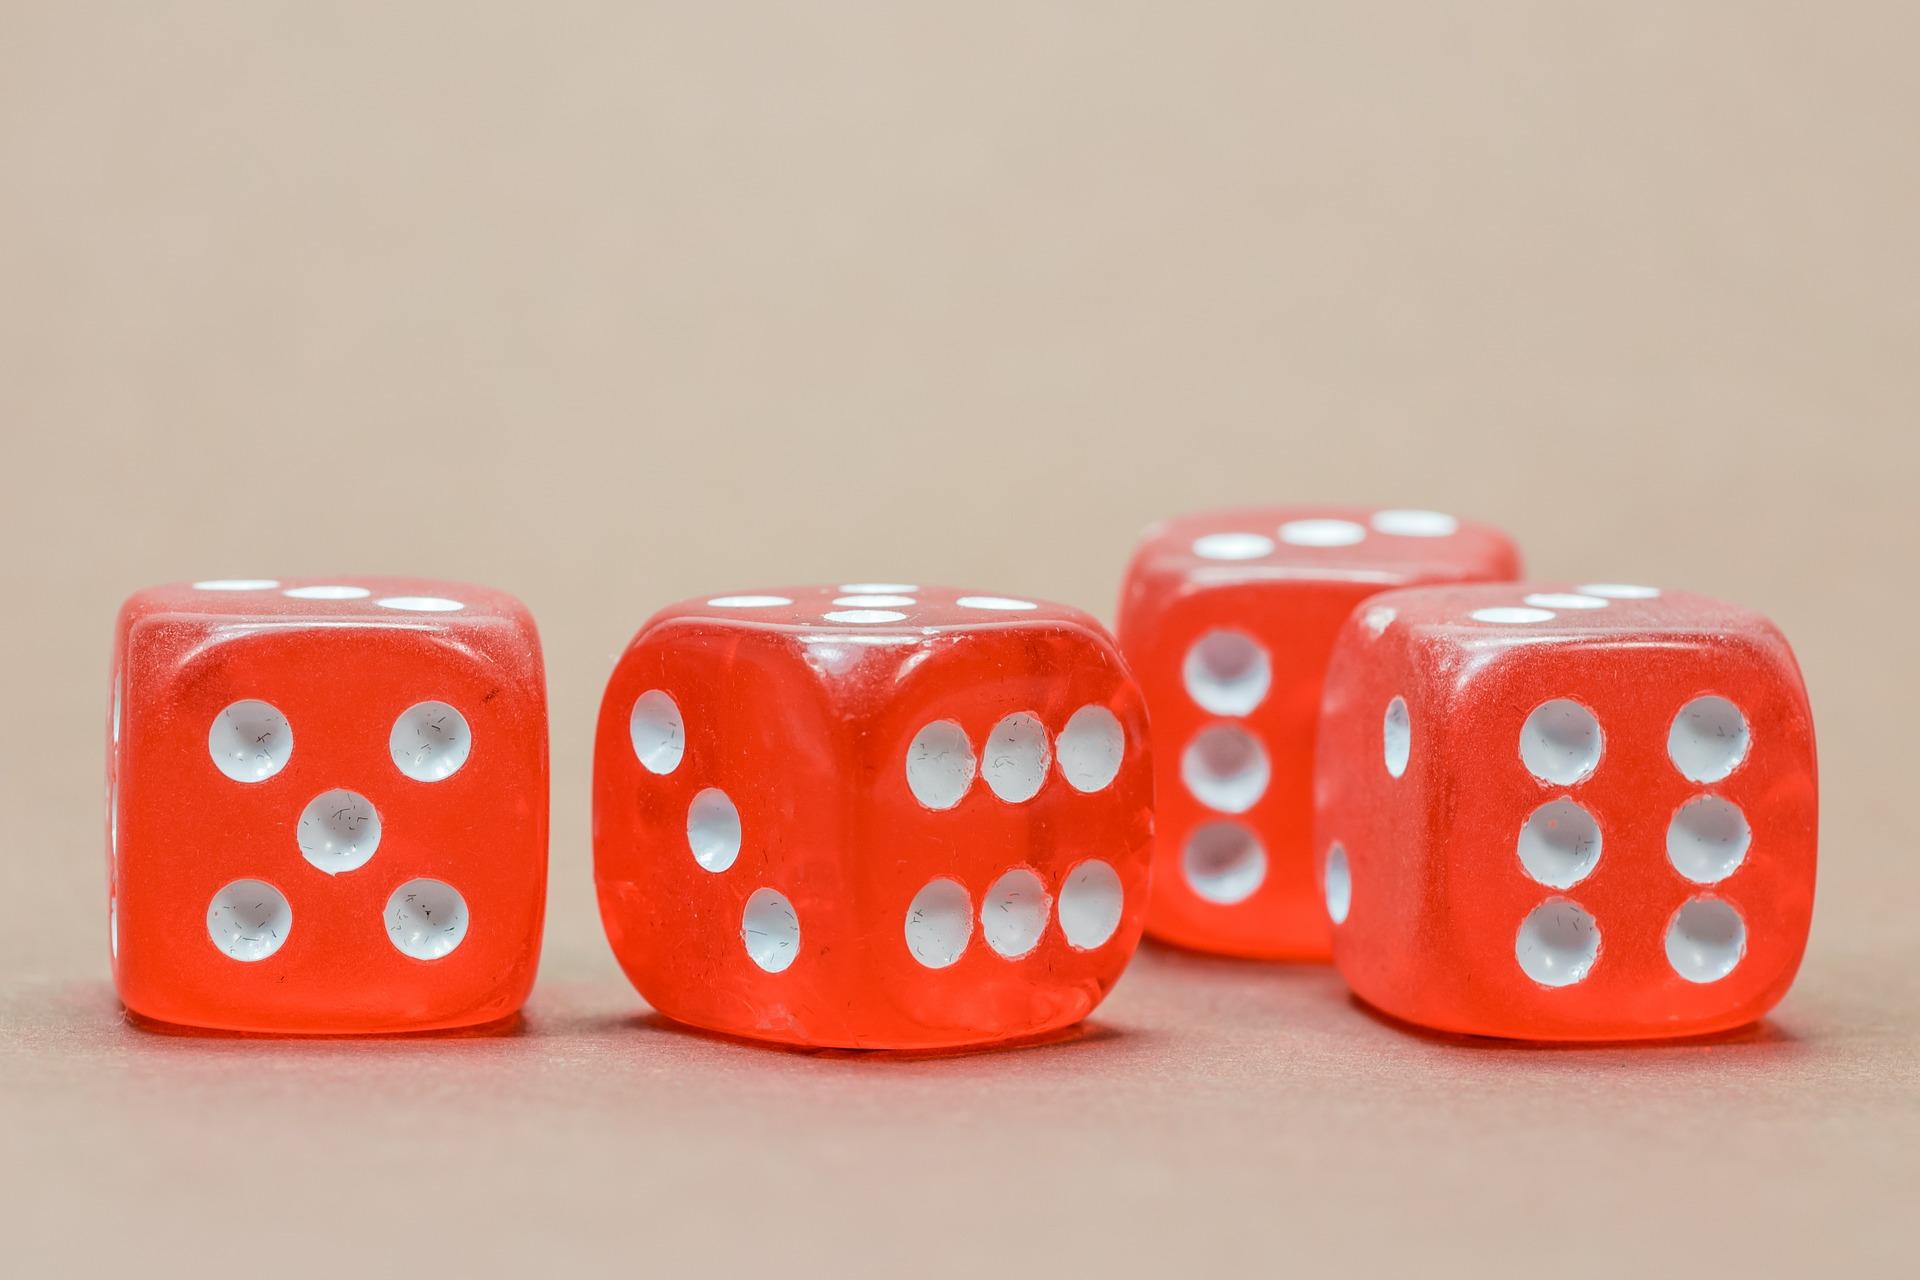 lottozahlen de online